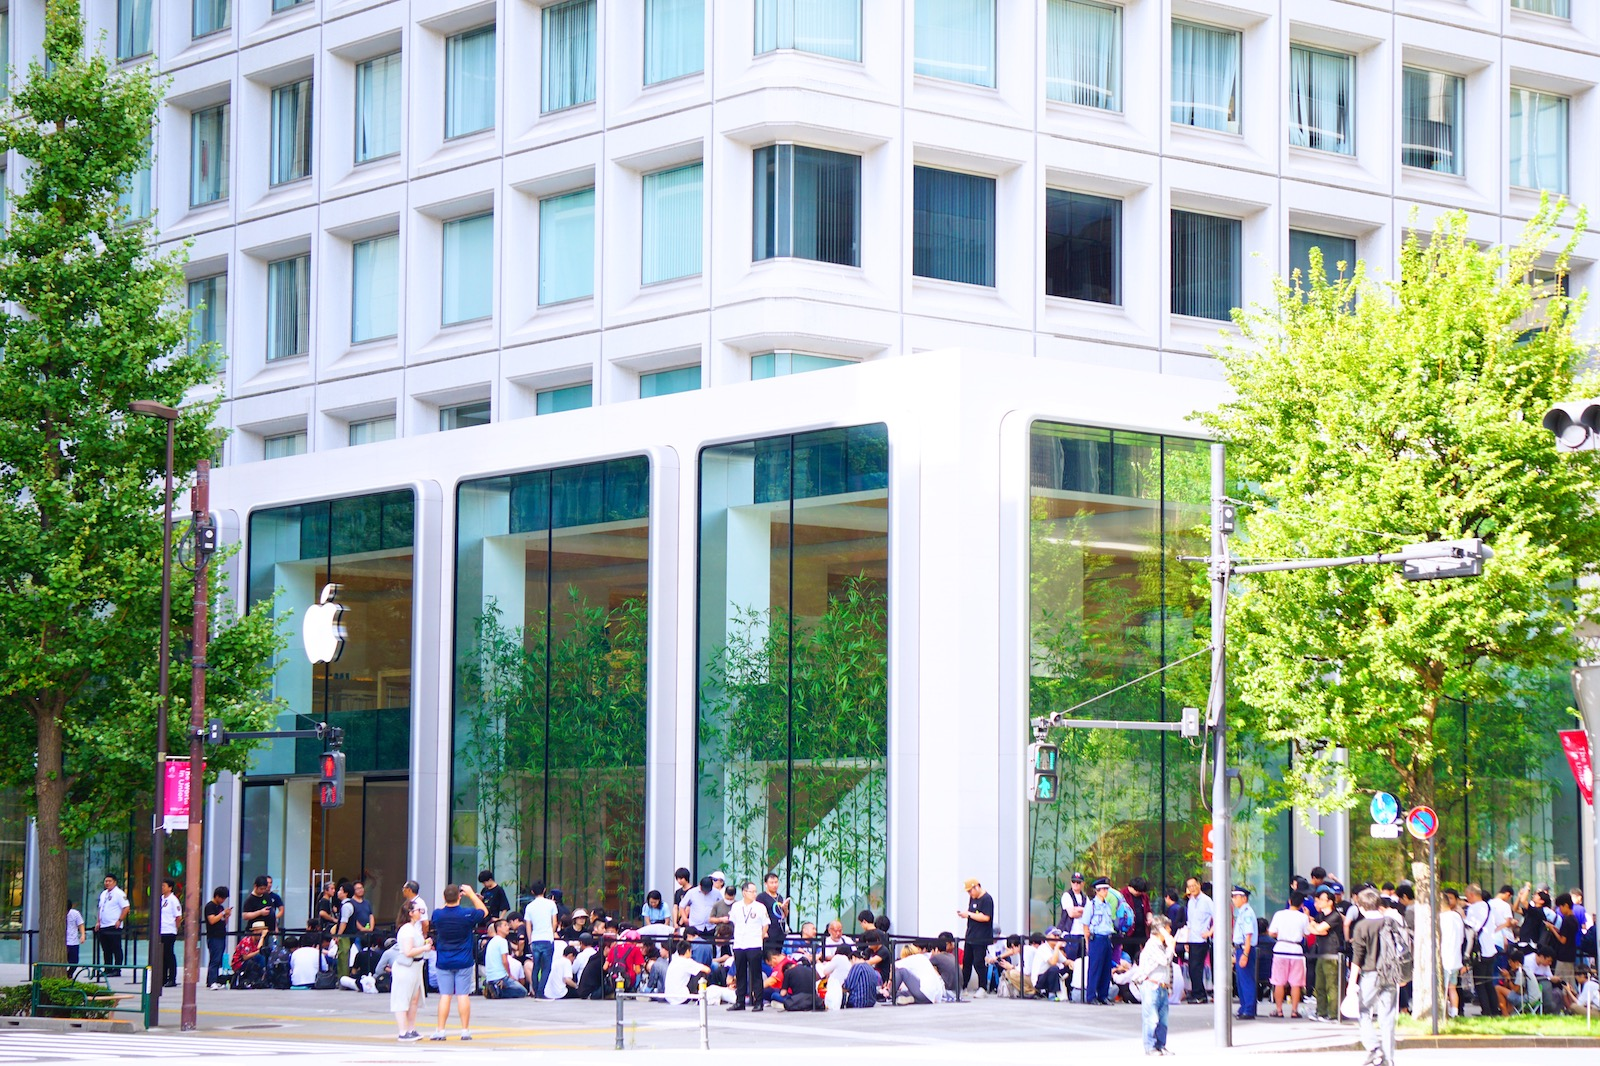 「Apple丸の内」がオープン。1,500人超の行列、記念トートバッグの配布終了